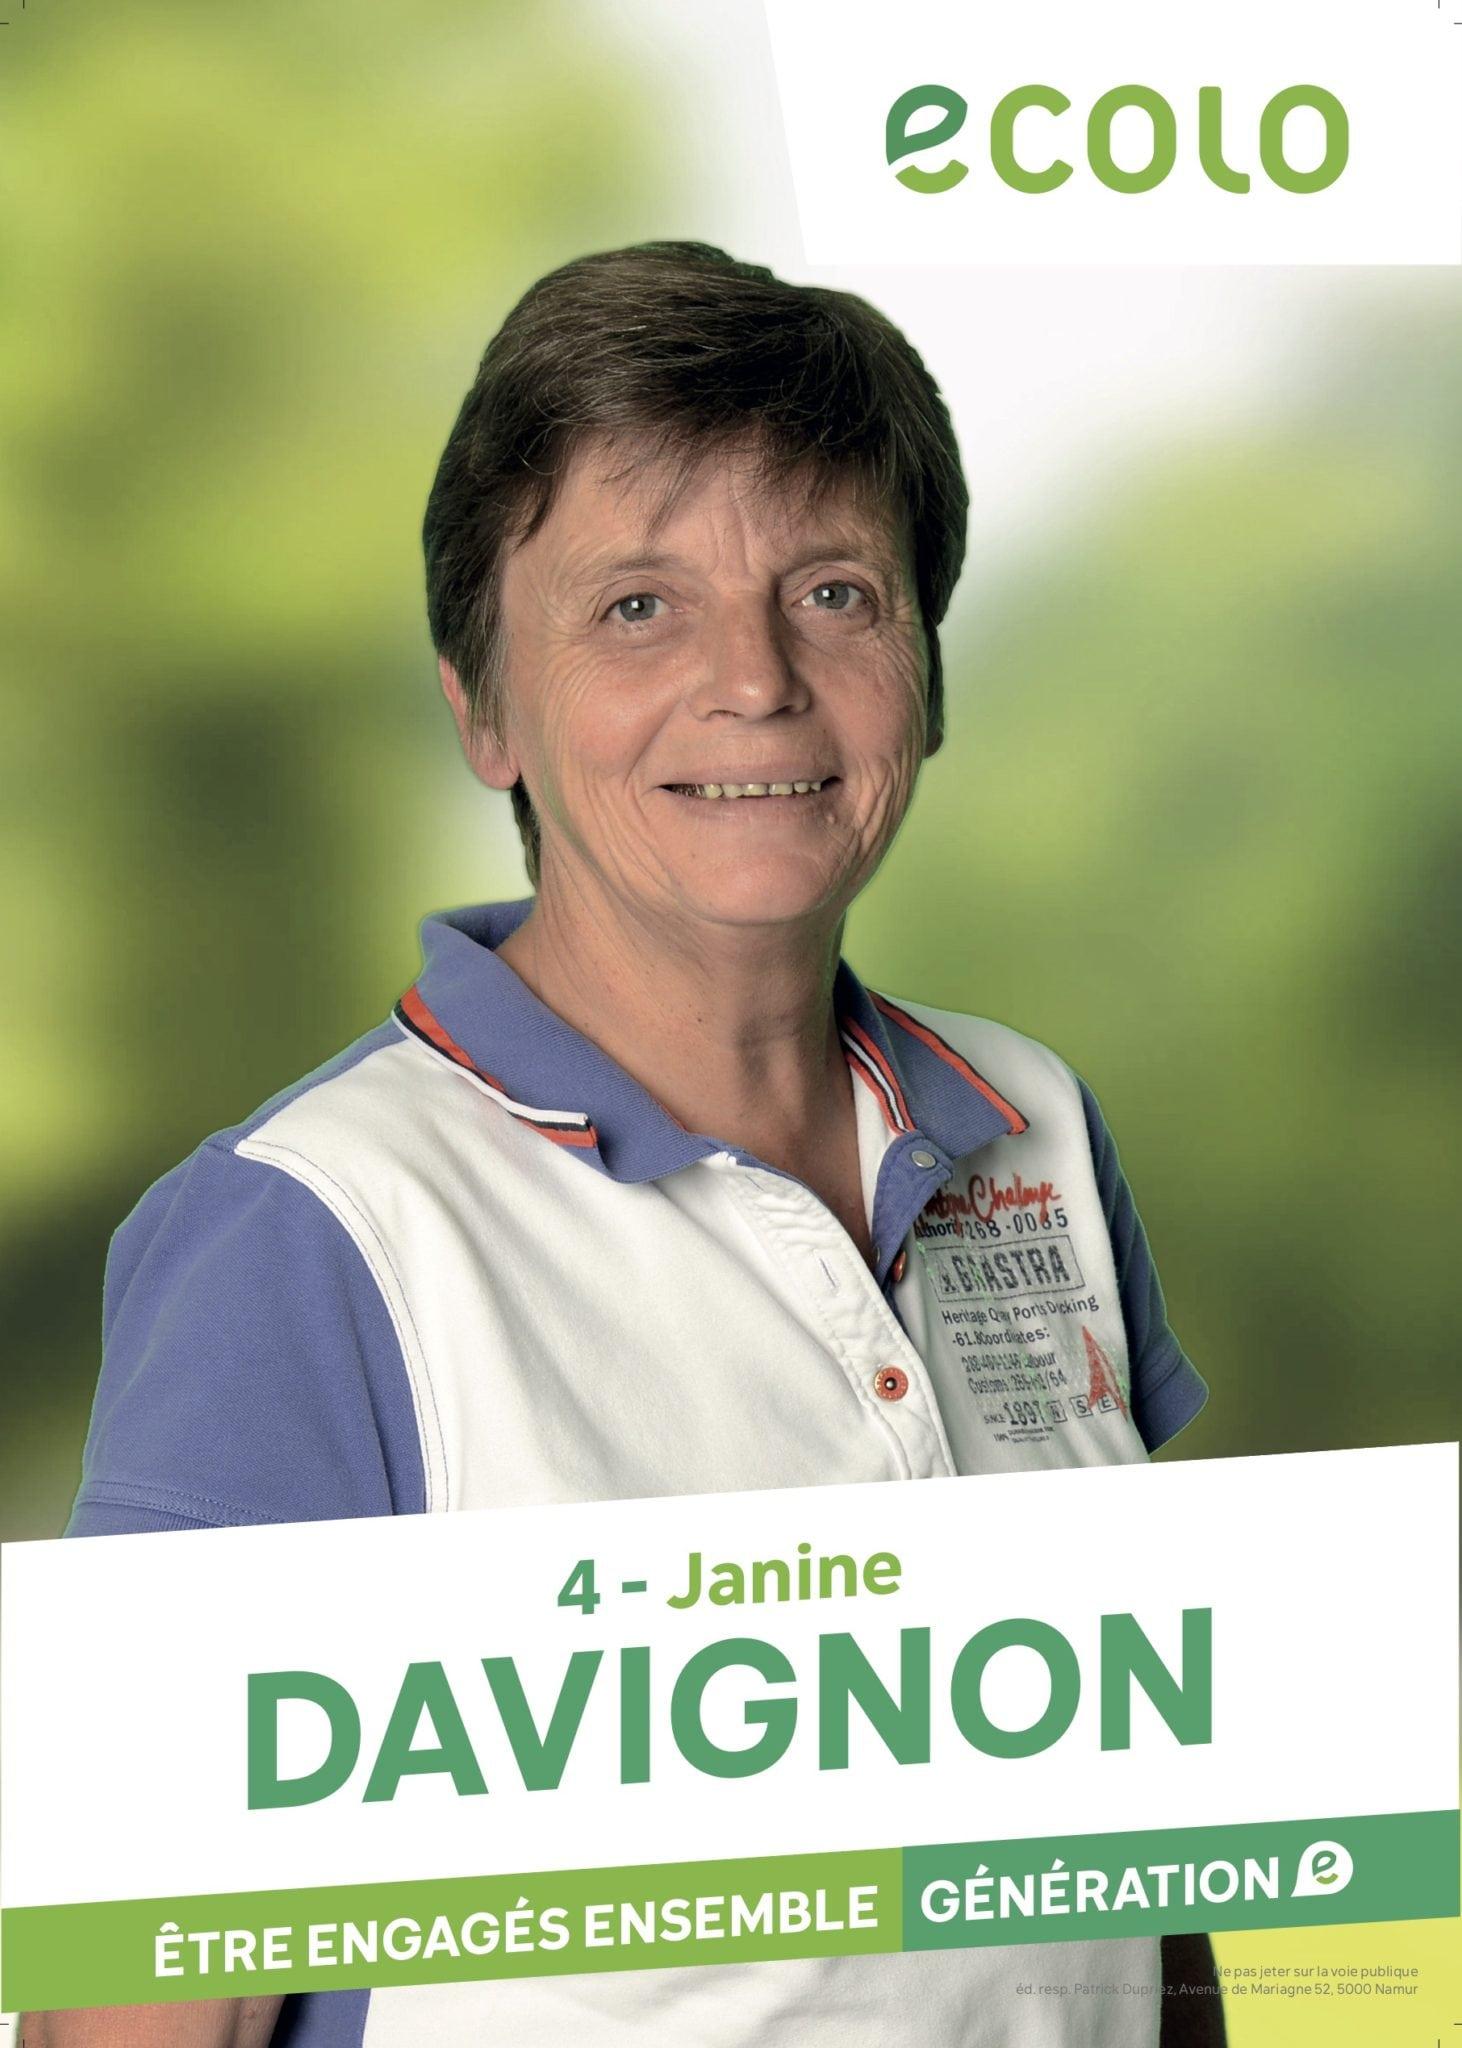 Janine Davignon